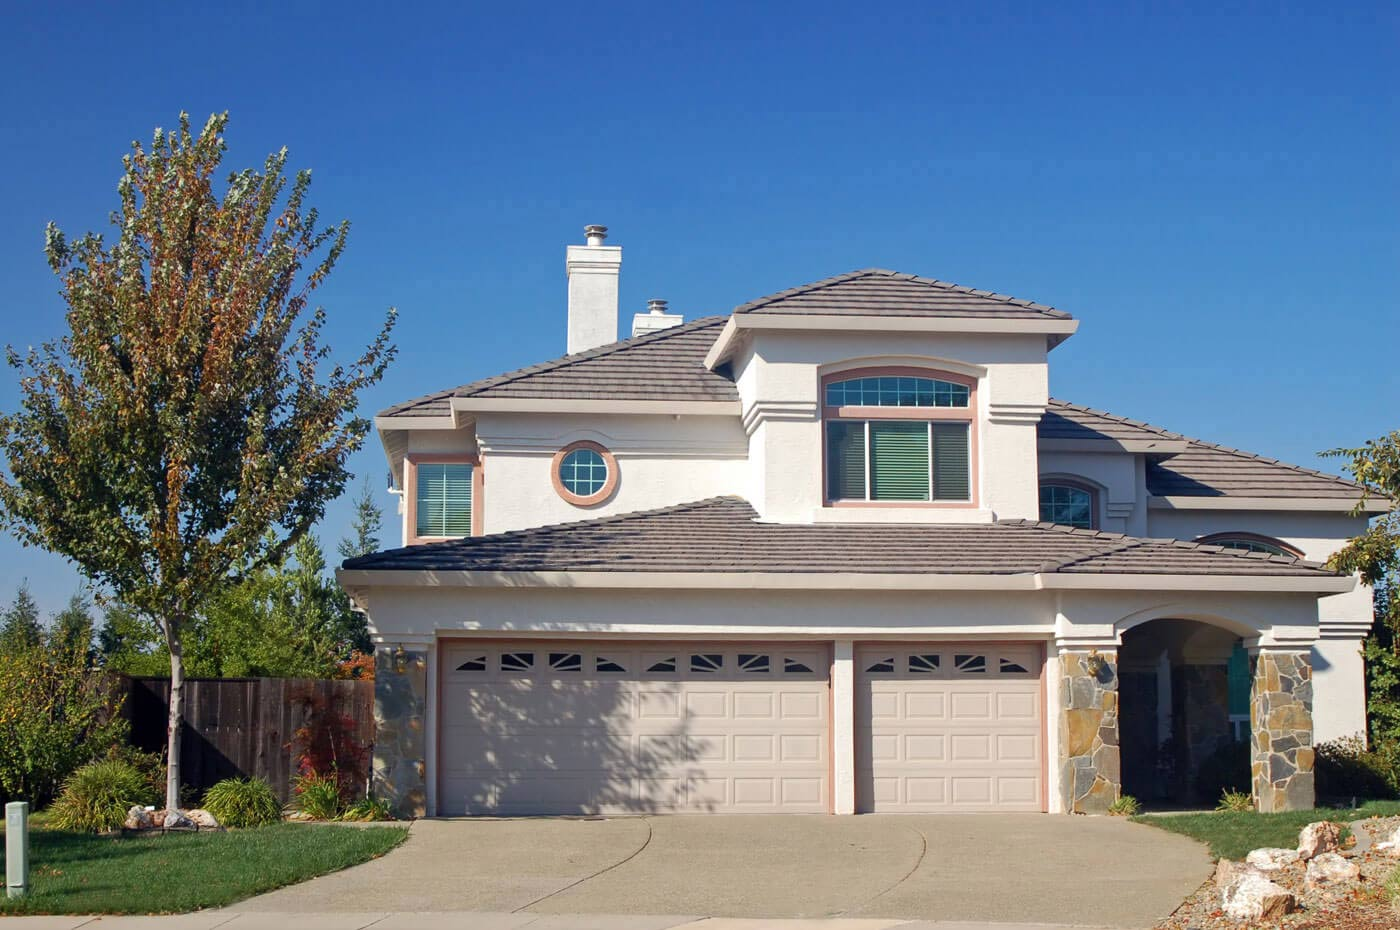 Best Kitchen Gallery: Mel Wilson Northridge California Real Estate Pany of Model Homes In Northridge California on rachelxblog.com